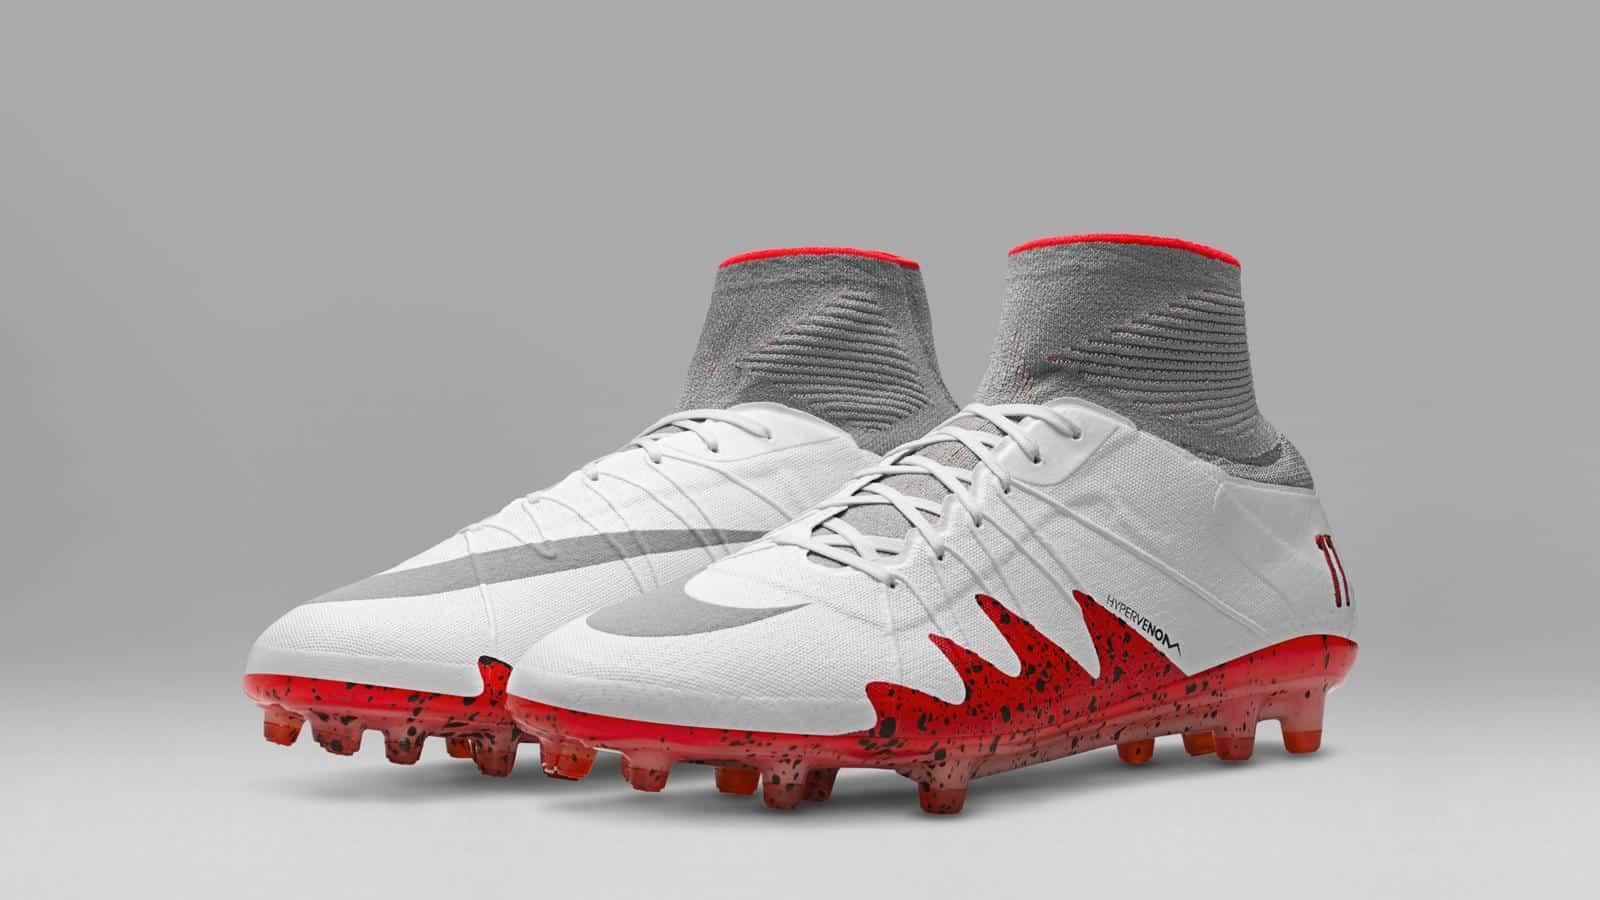 chaussure-foot-nike-hypervenom-neymar-jordan-blanc-octobre-2016-4